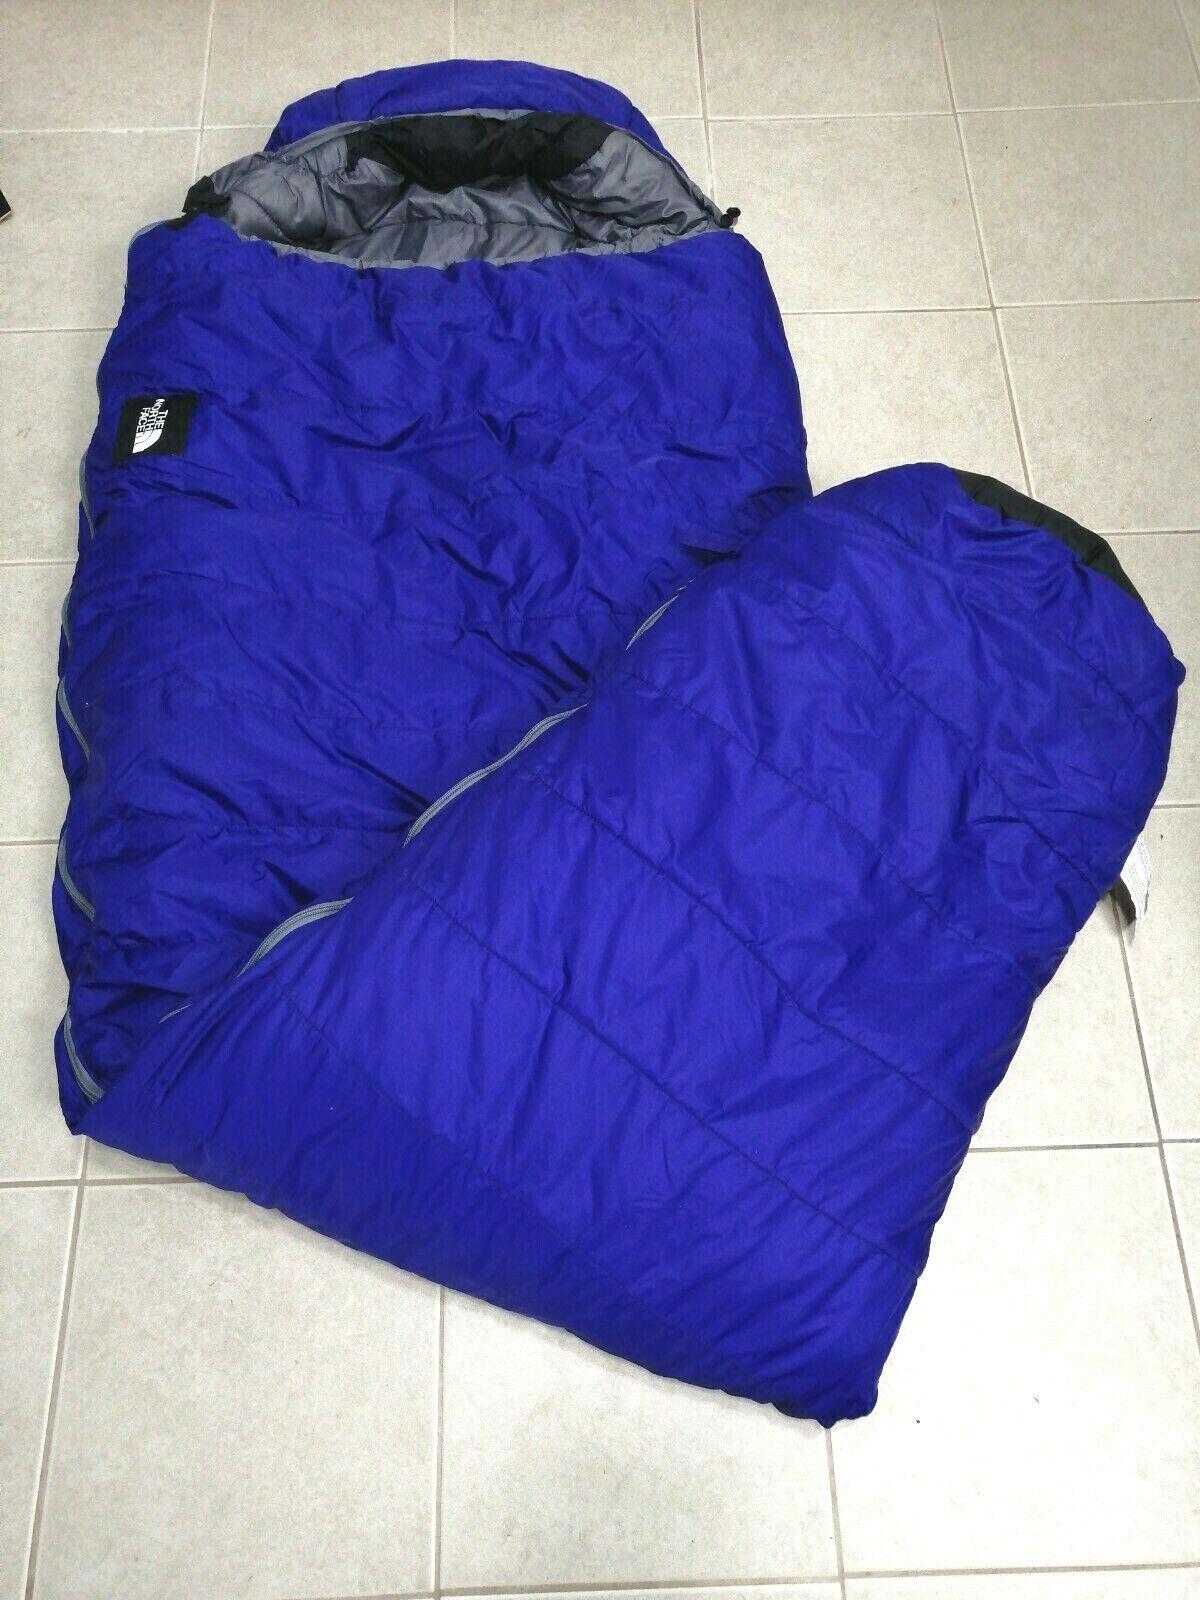 North Face Bigfoot Sleeping Bag blu 80 x 29  Polarguard READ